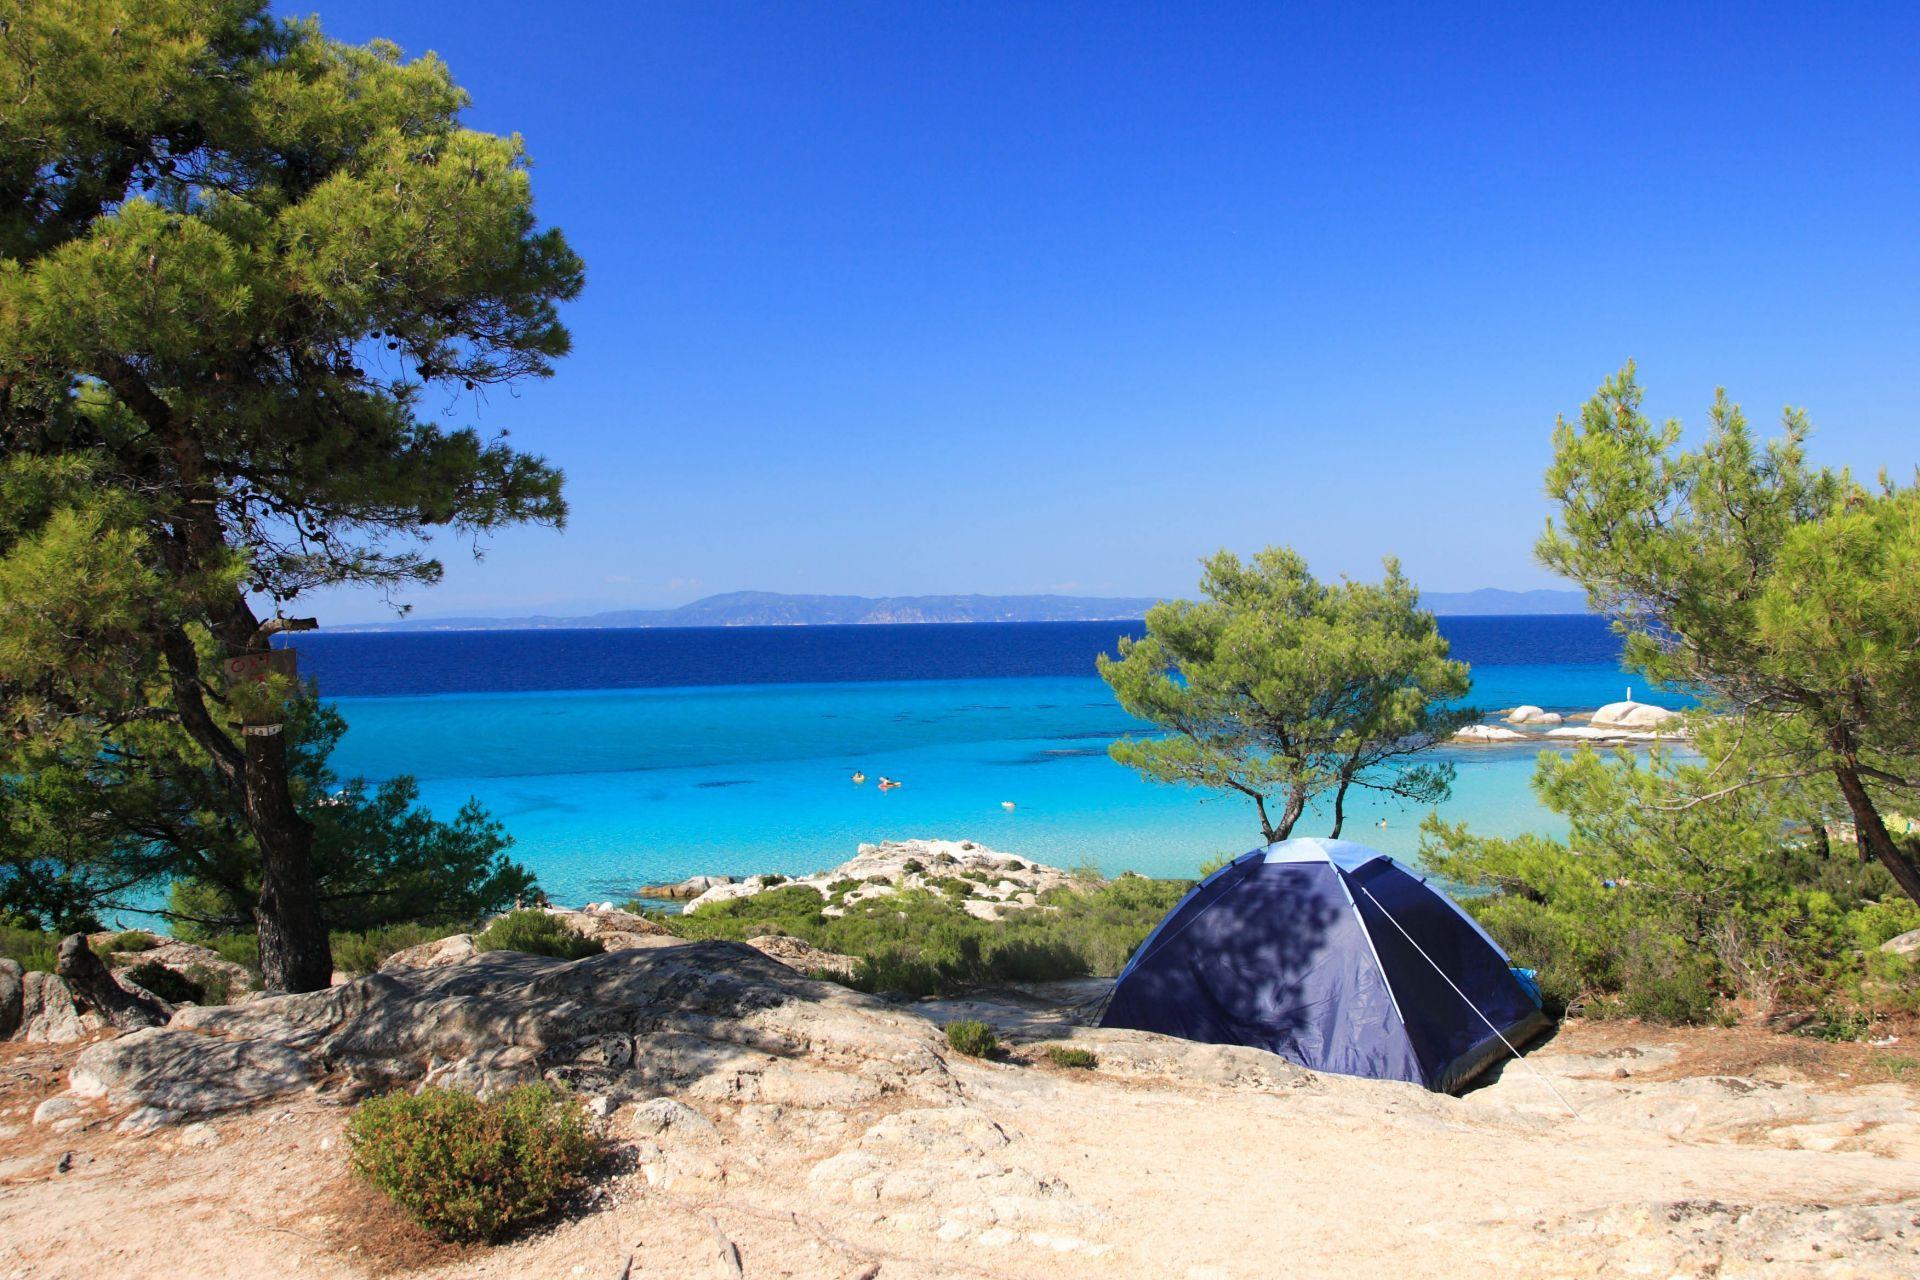 Campings in Greece